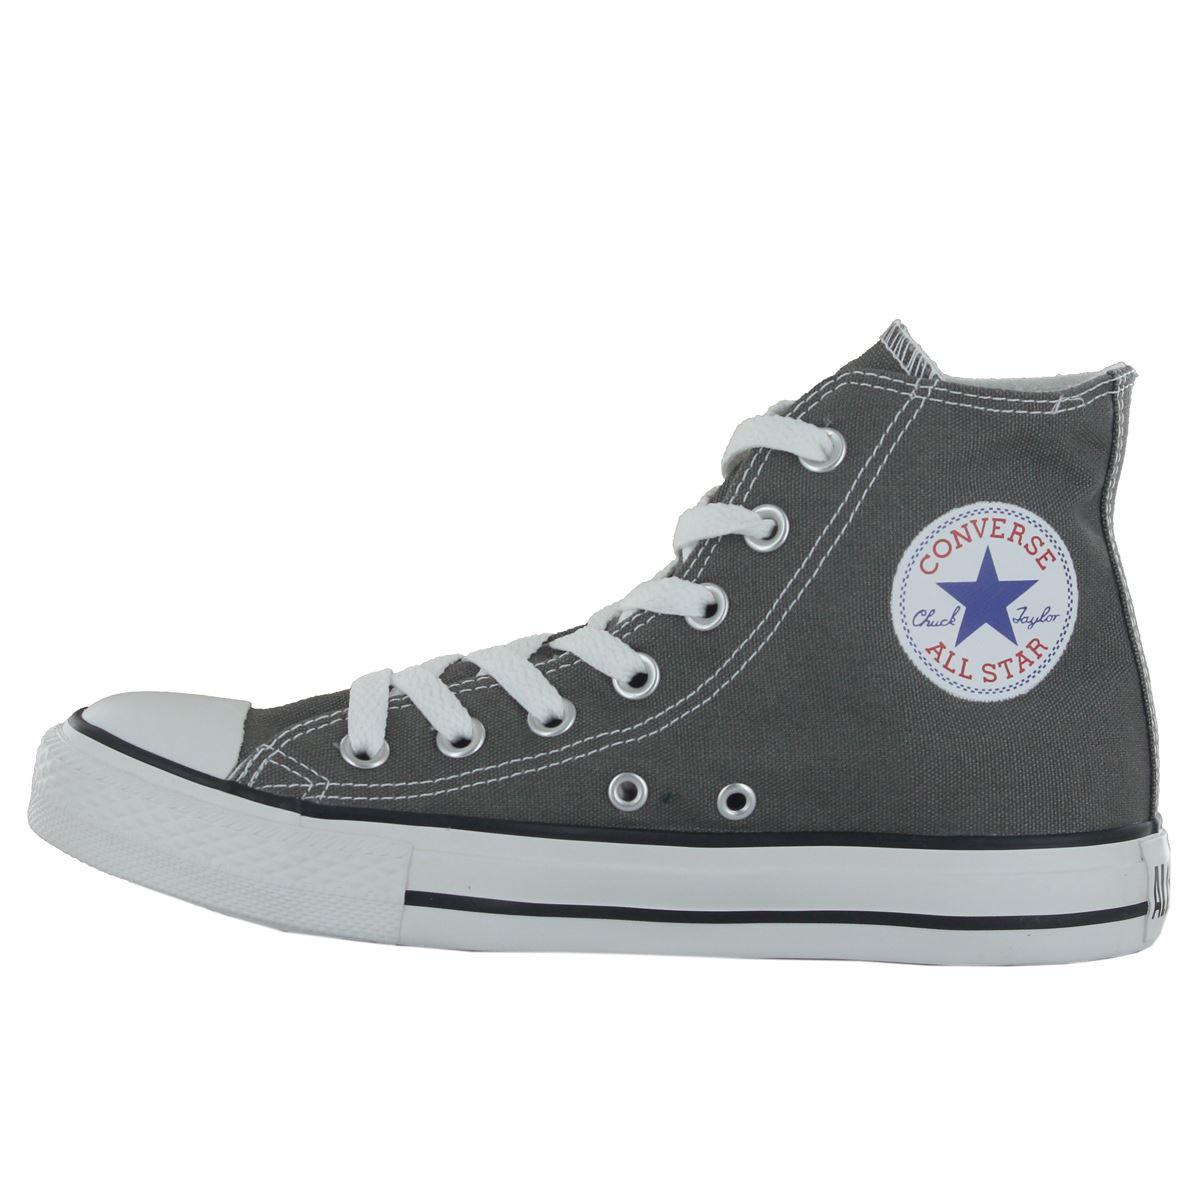 Converse-Chuck-Taylor-All-Star-Hi-Canvas-Mens-Womens-Ladies-Unisex-Trainers miniatuur 20